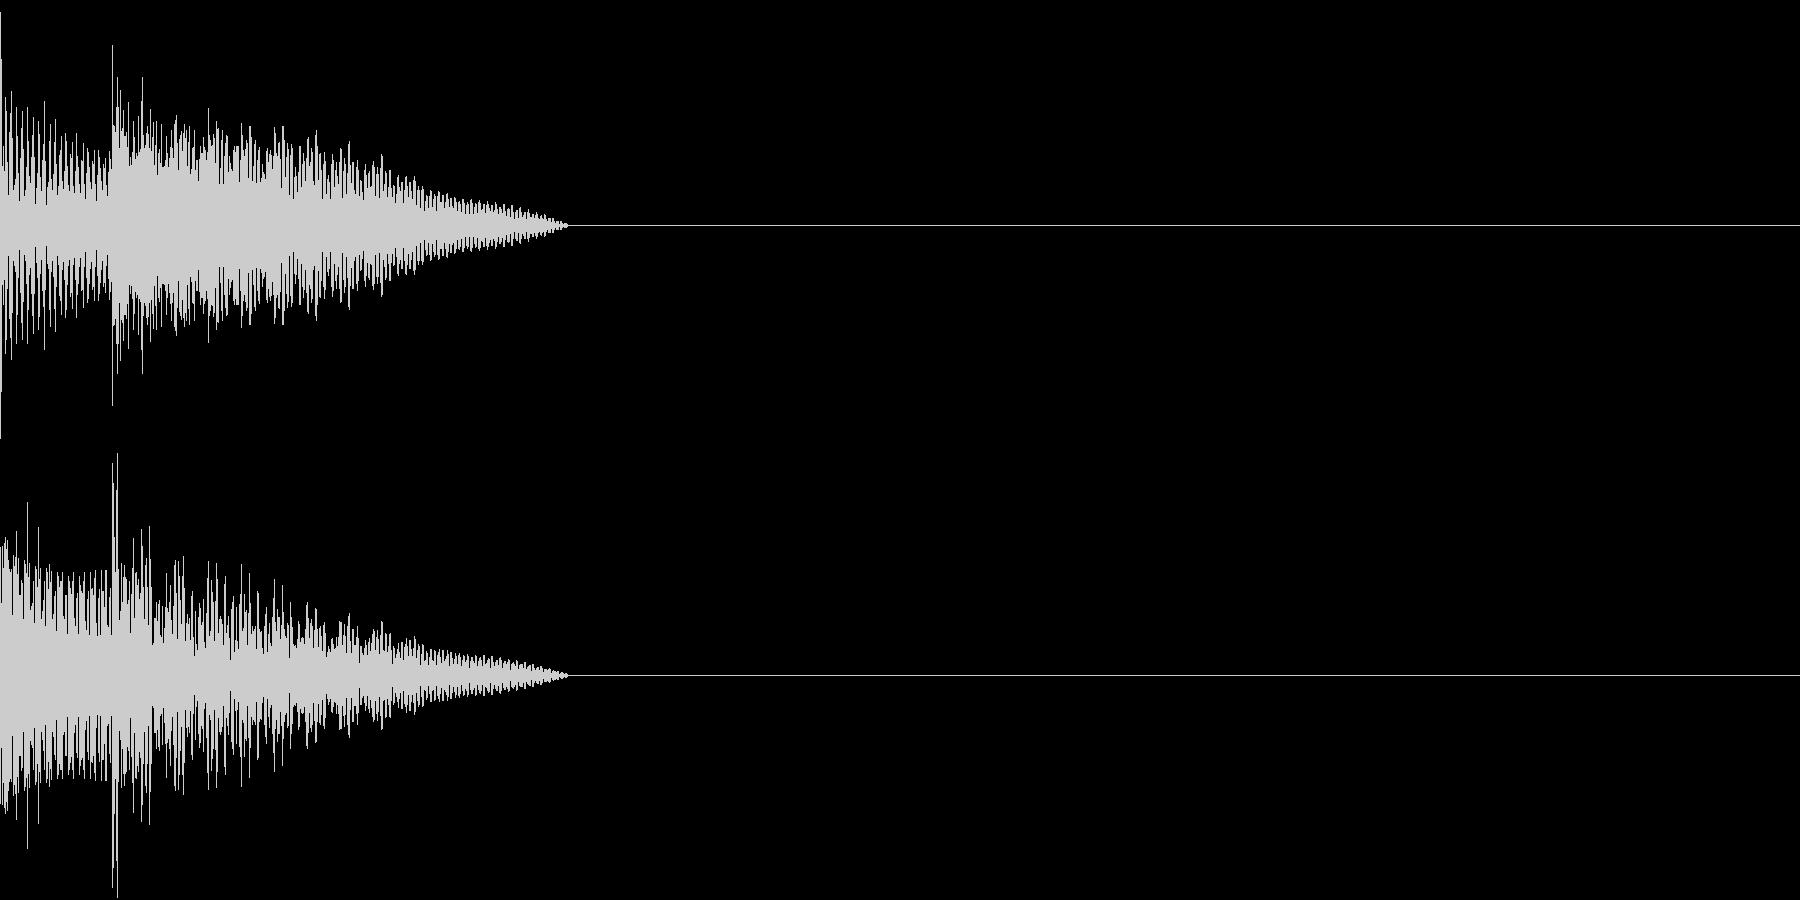 Cursor セレクト・カーソルの音2の未再生の波形